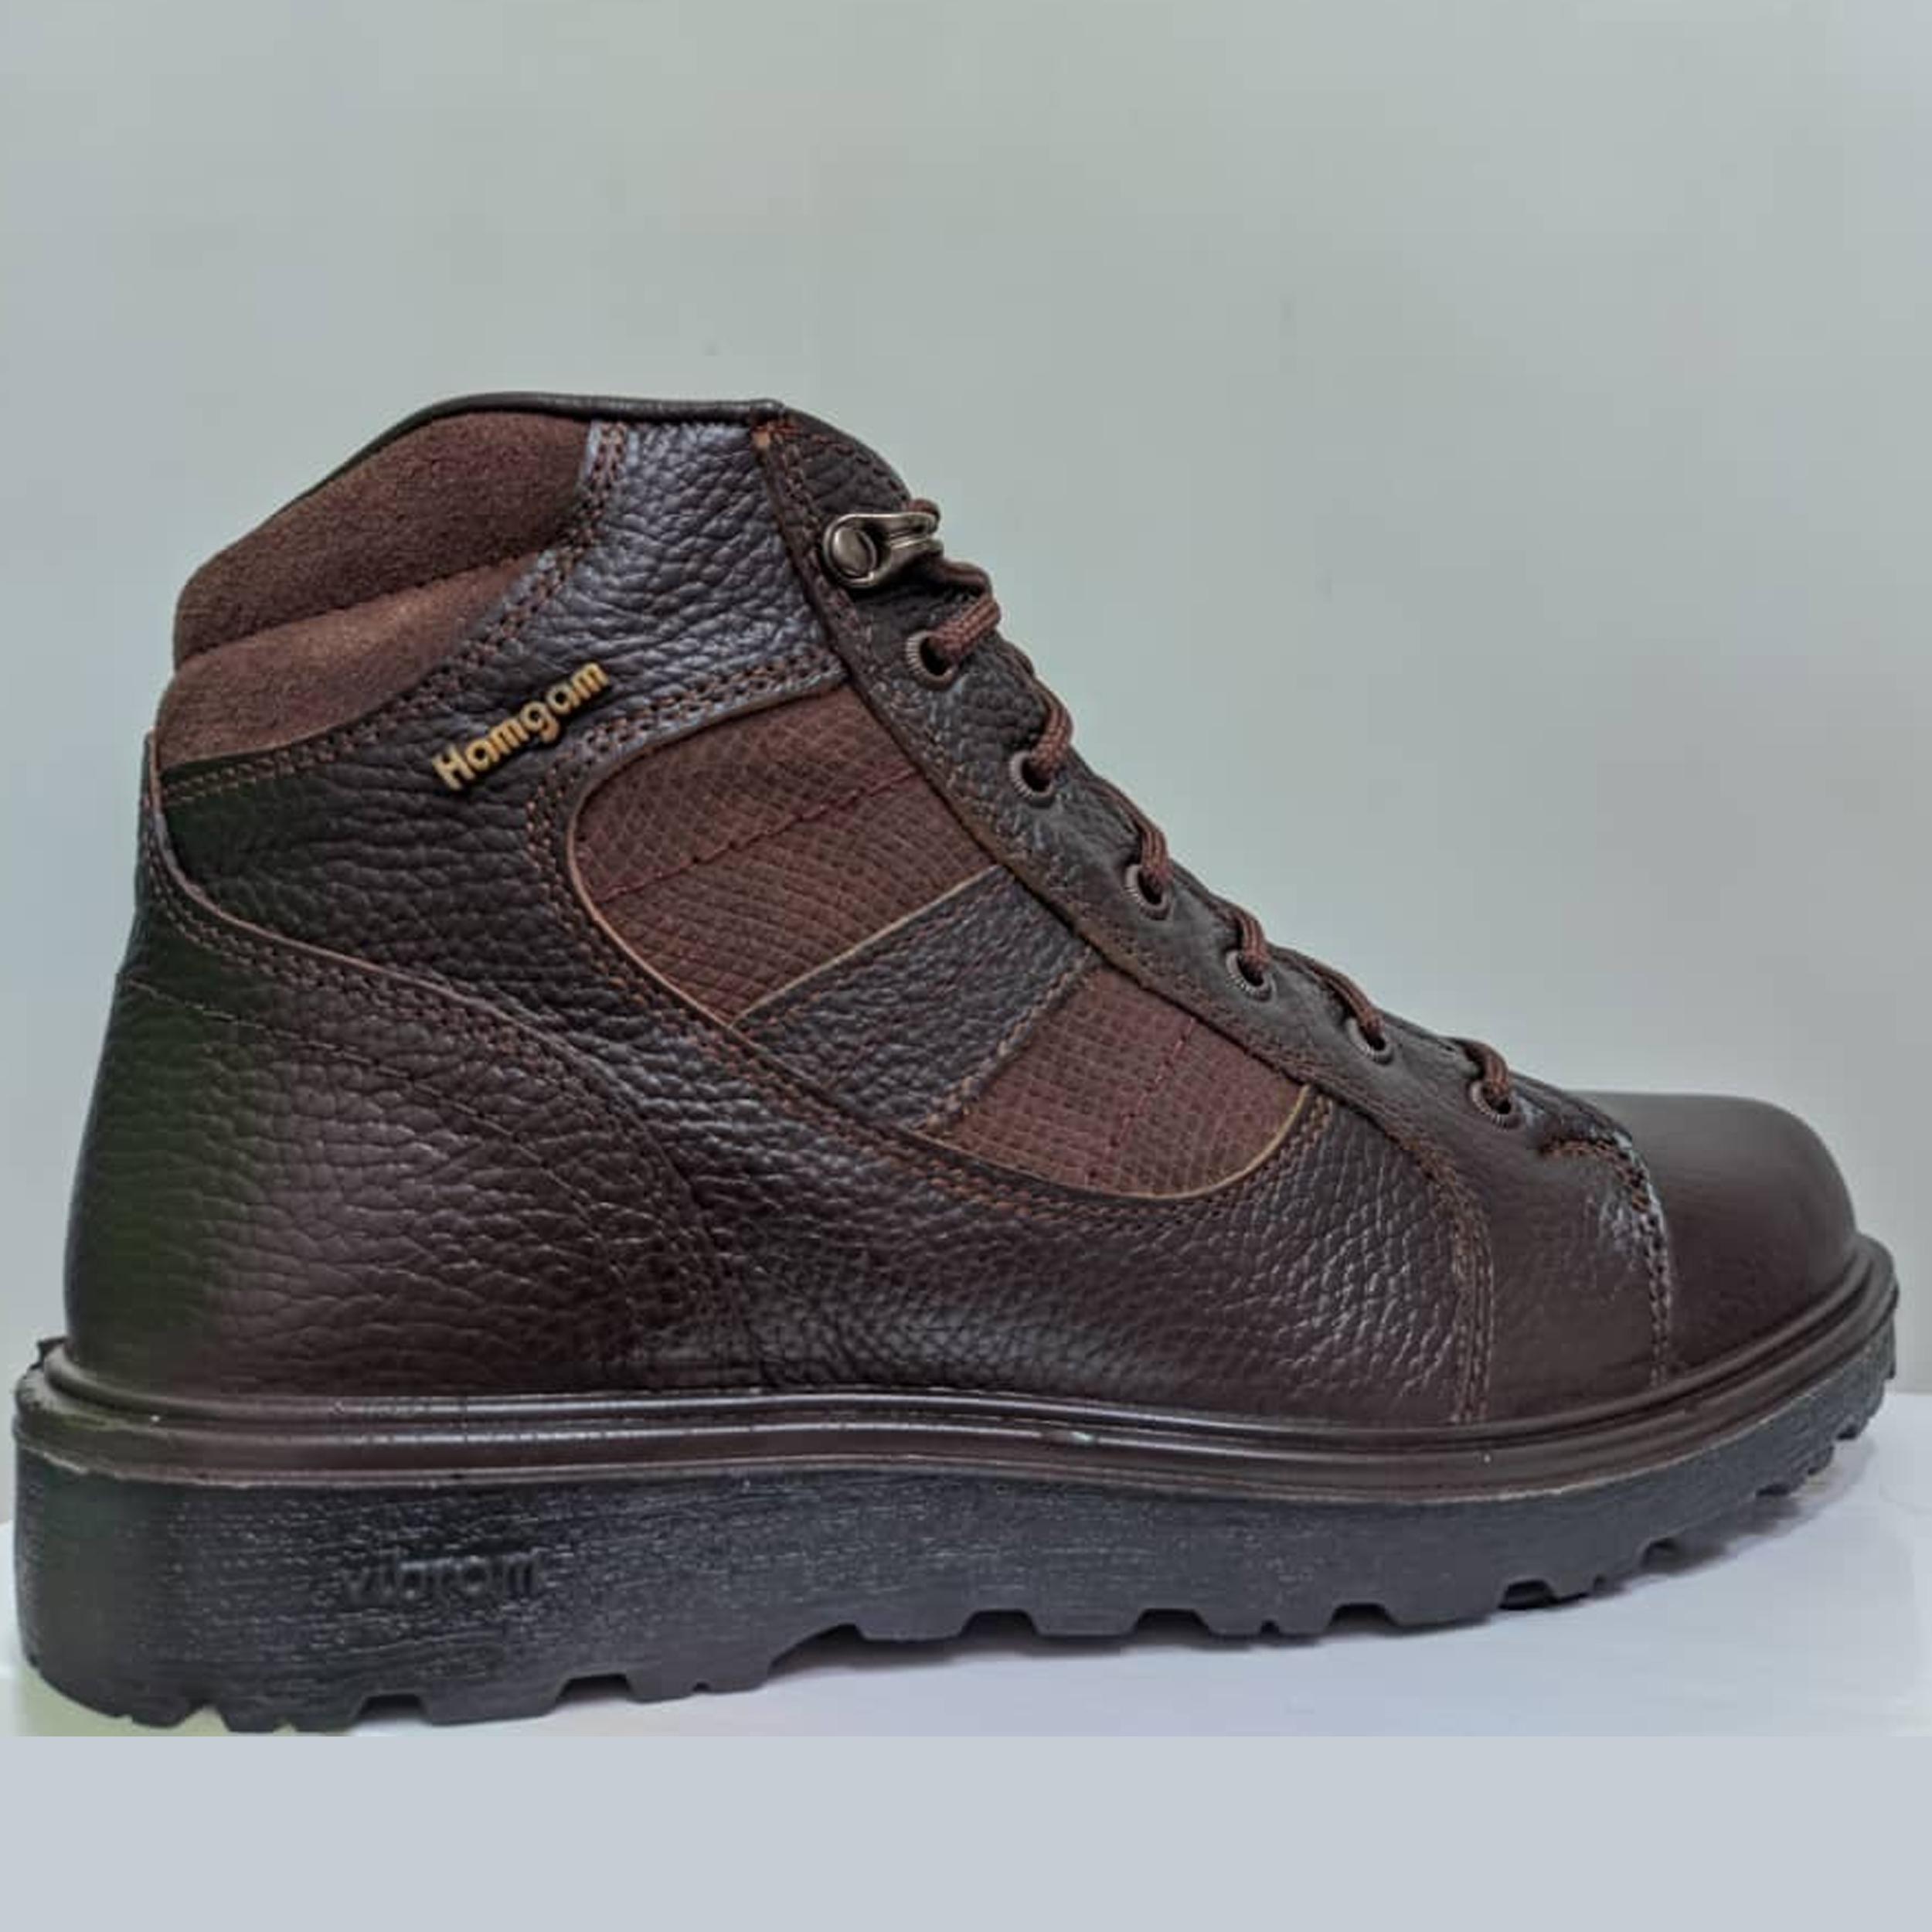 خرید                                     کفش کوهنوردی مردانه همگام مدل 252